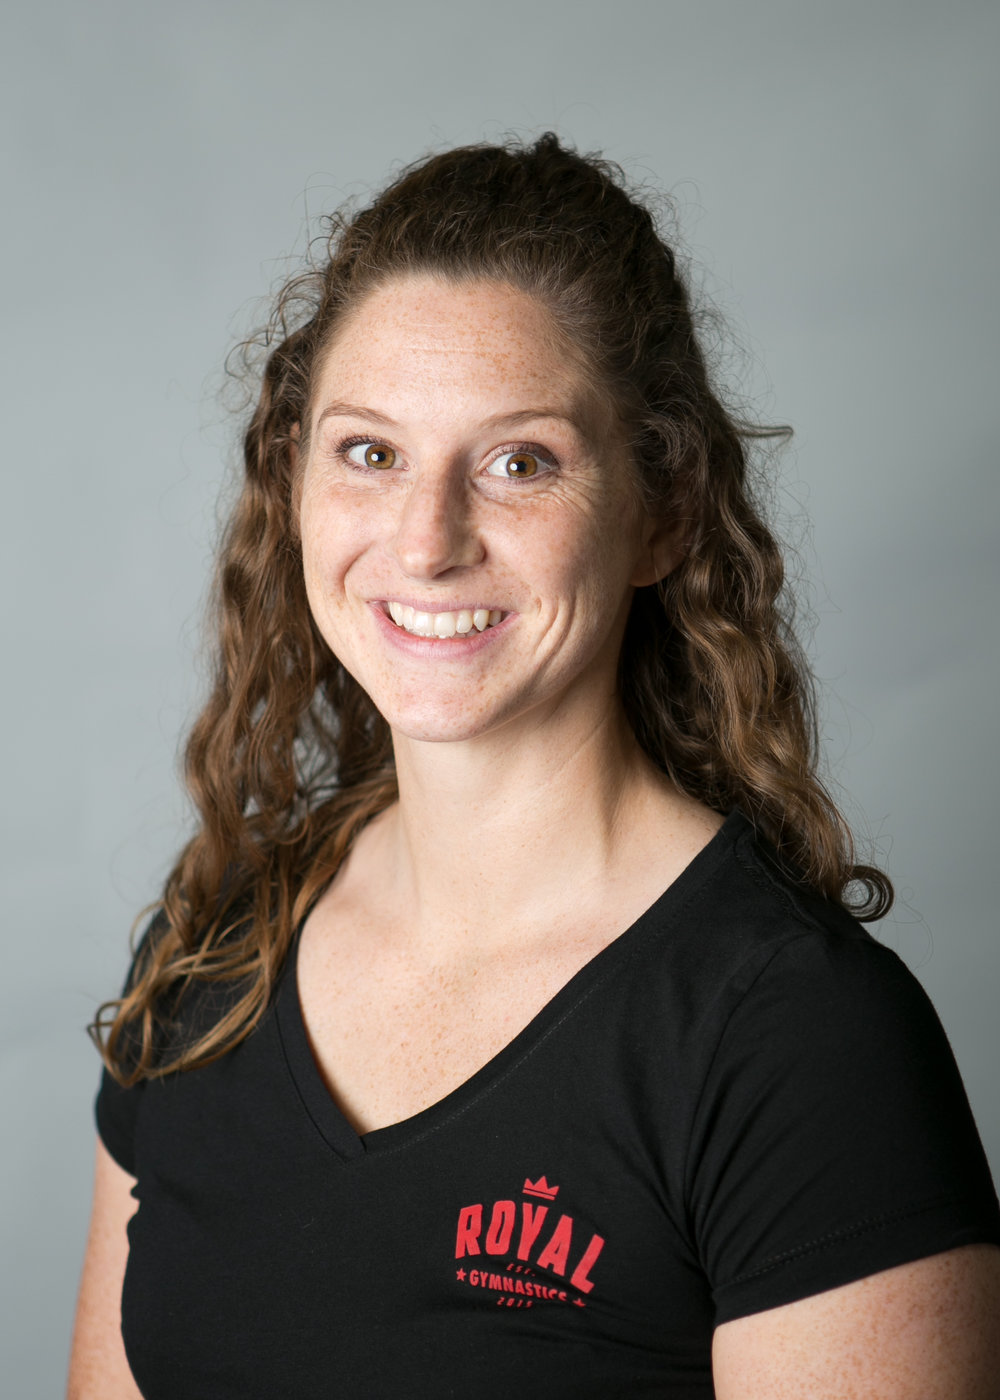 Coach Sarah Preschool Coach